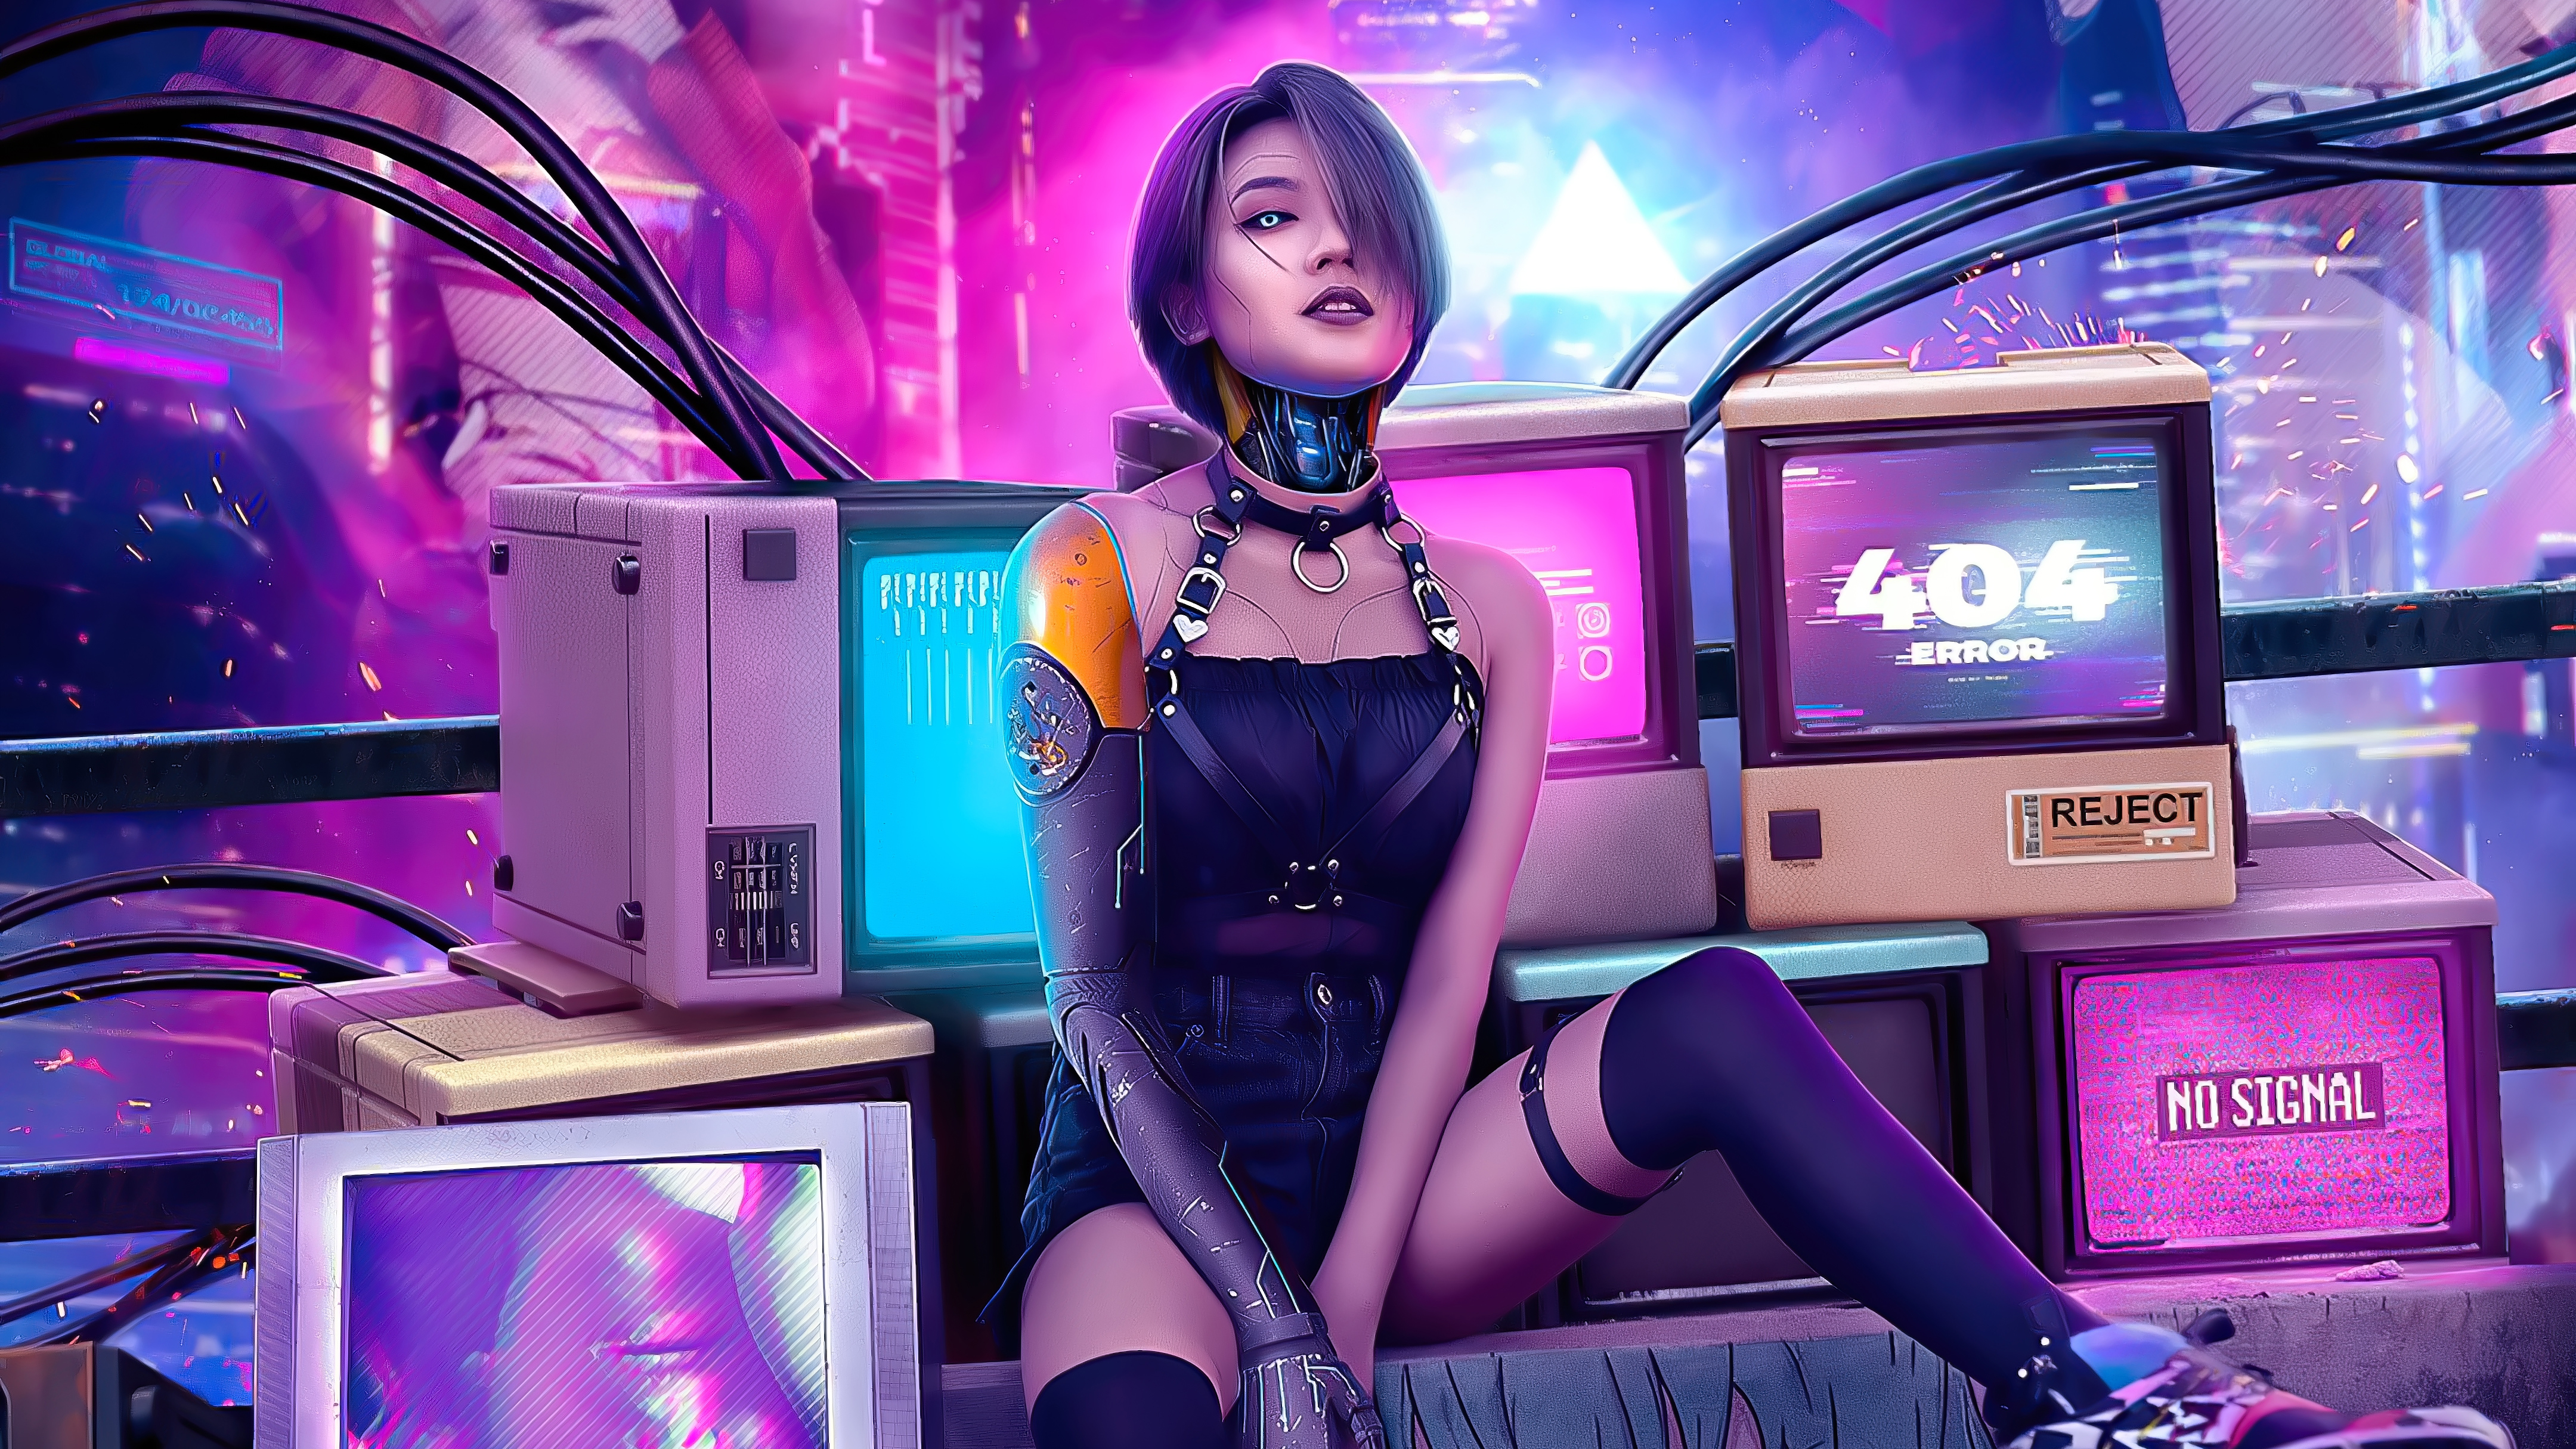 Cool Cyberpunk Cyborg Girl Wallpaper, HD Games 4K ...